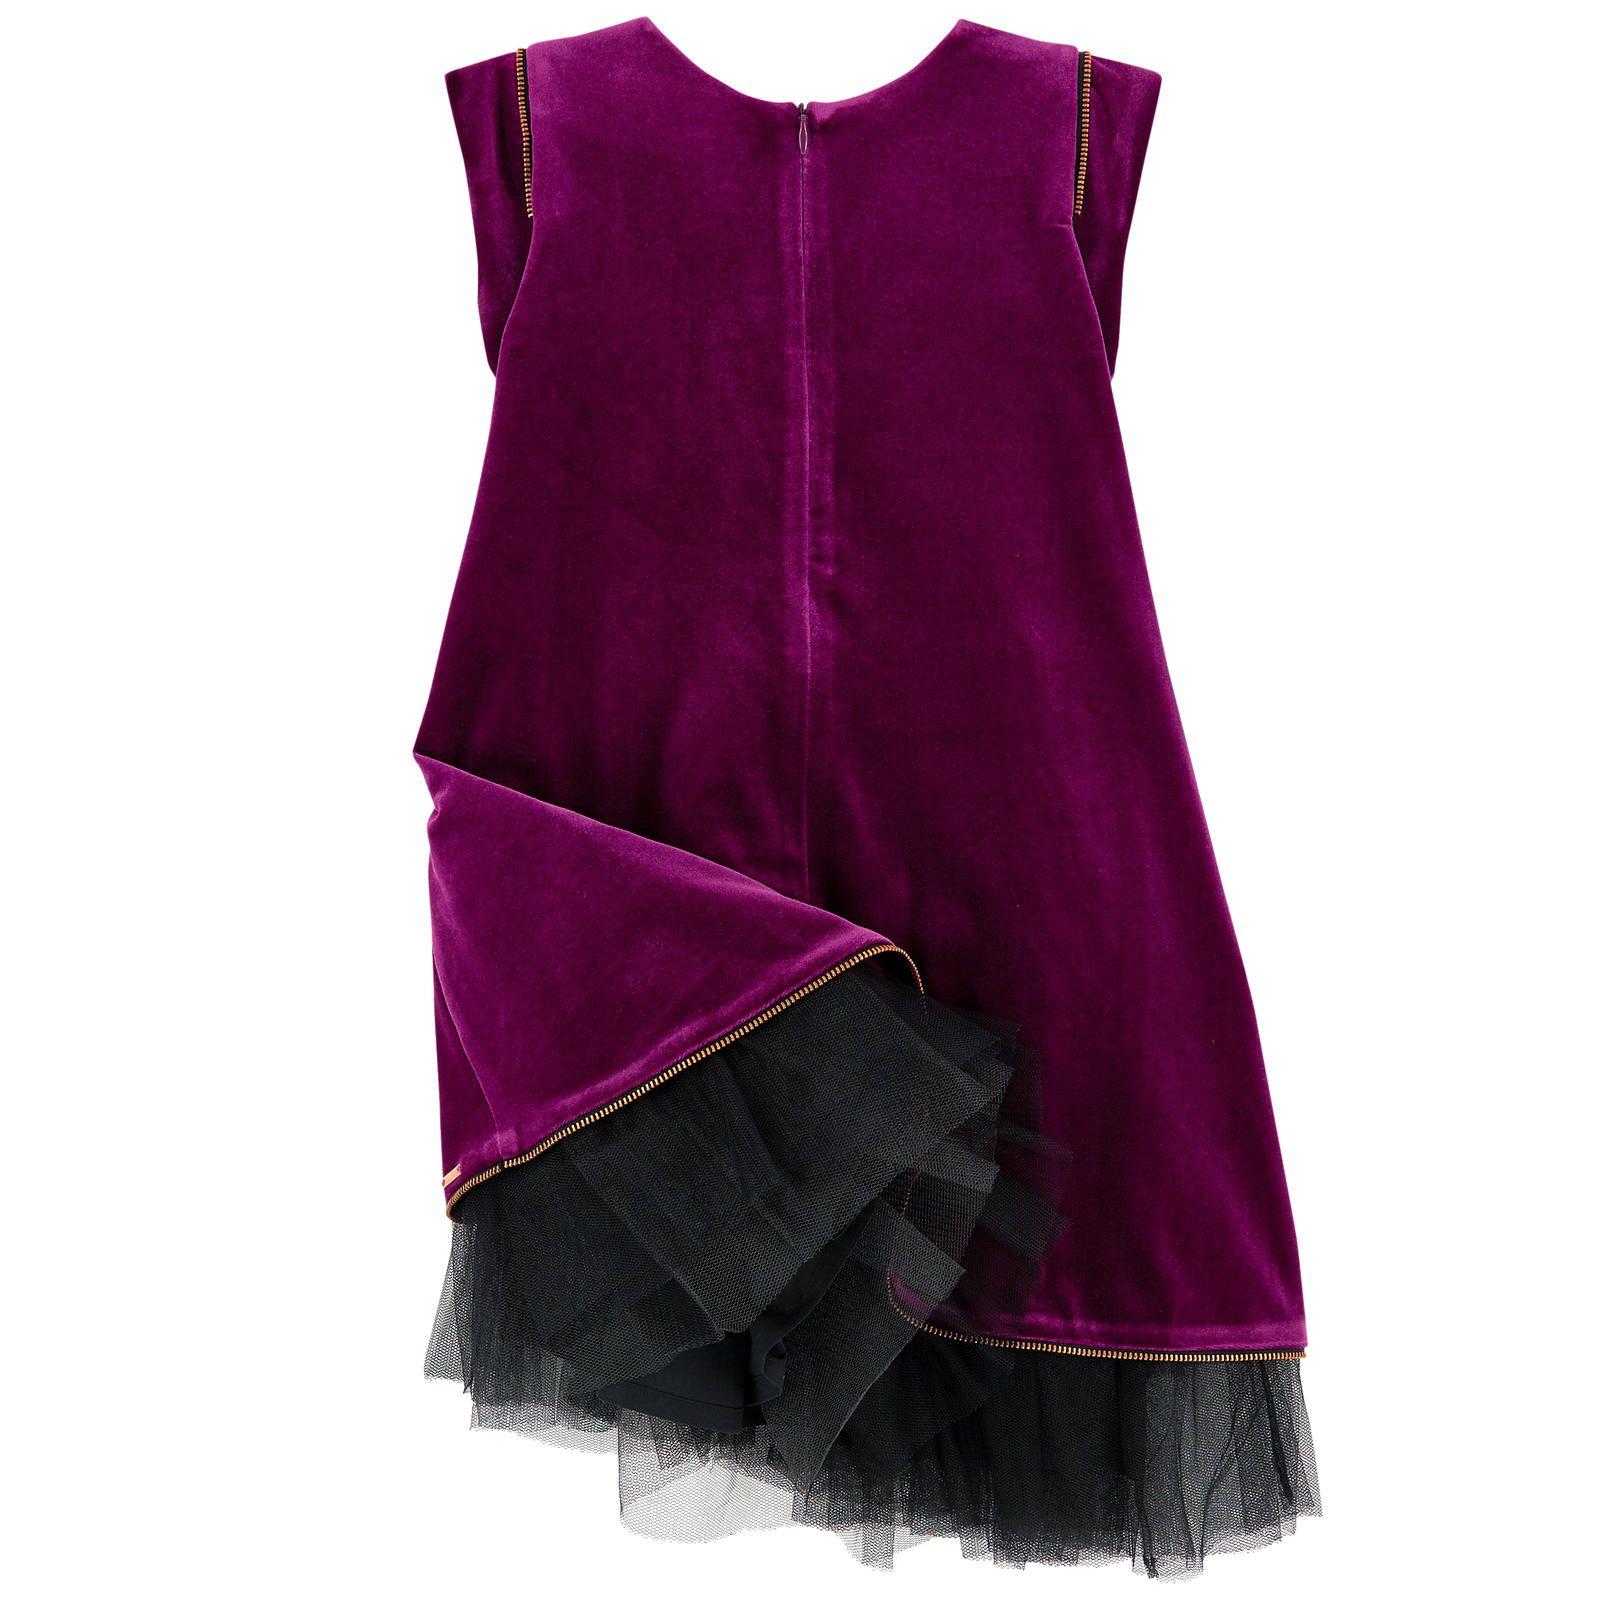 09116a47d055 Платье из бархата   Velvets в 2019 г.   Velvet, Dresses и Velvet fashion